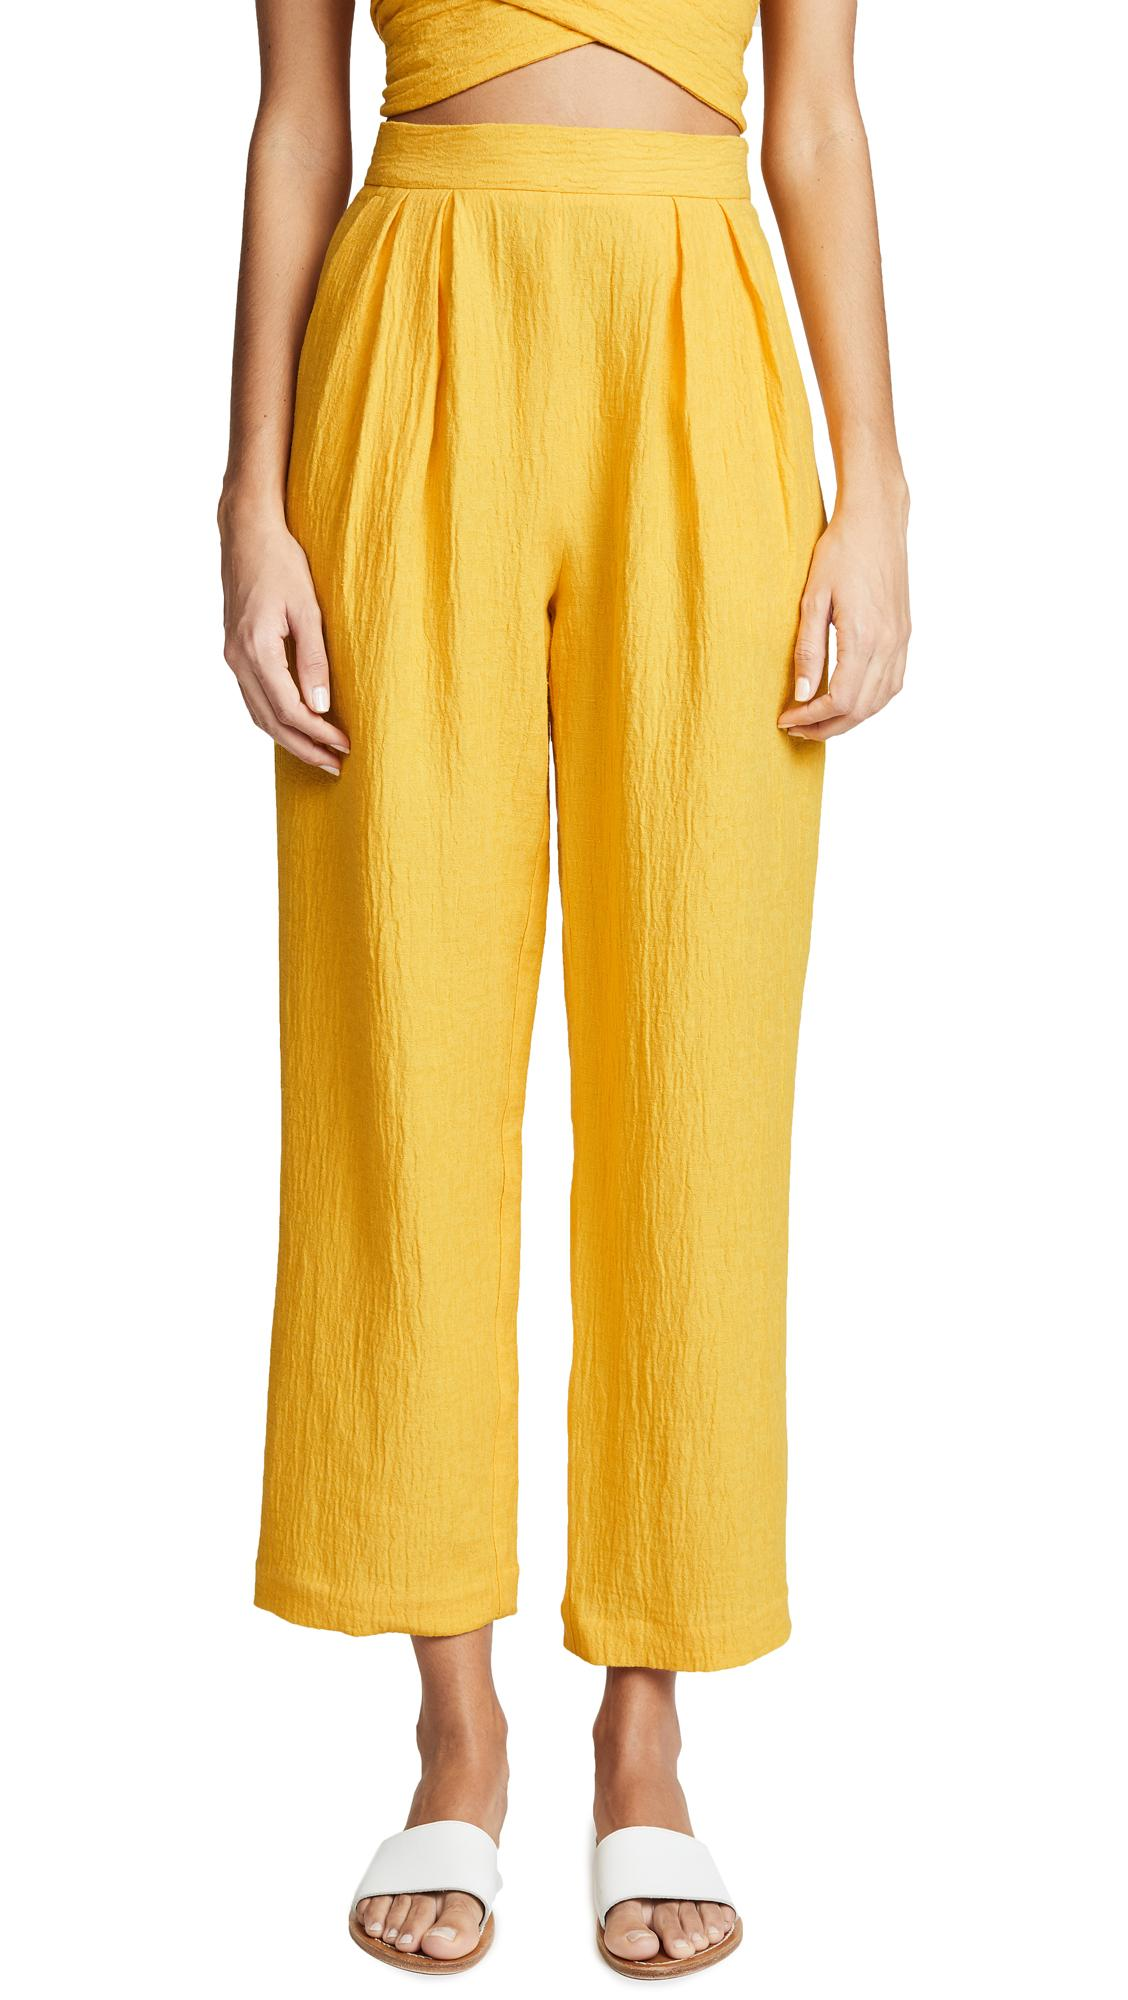 Mara Hoffman Audre Pants In Yellow